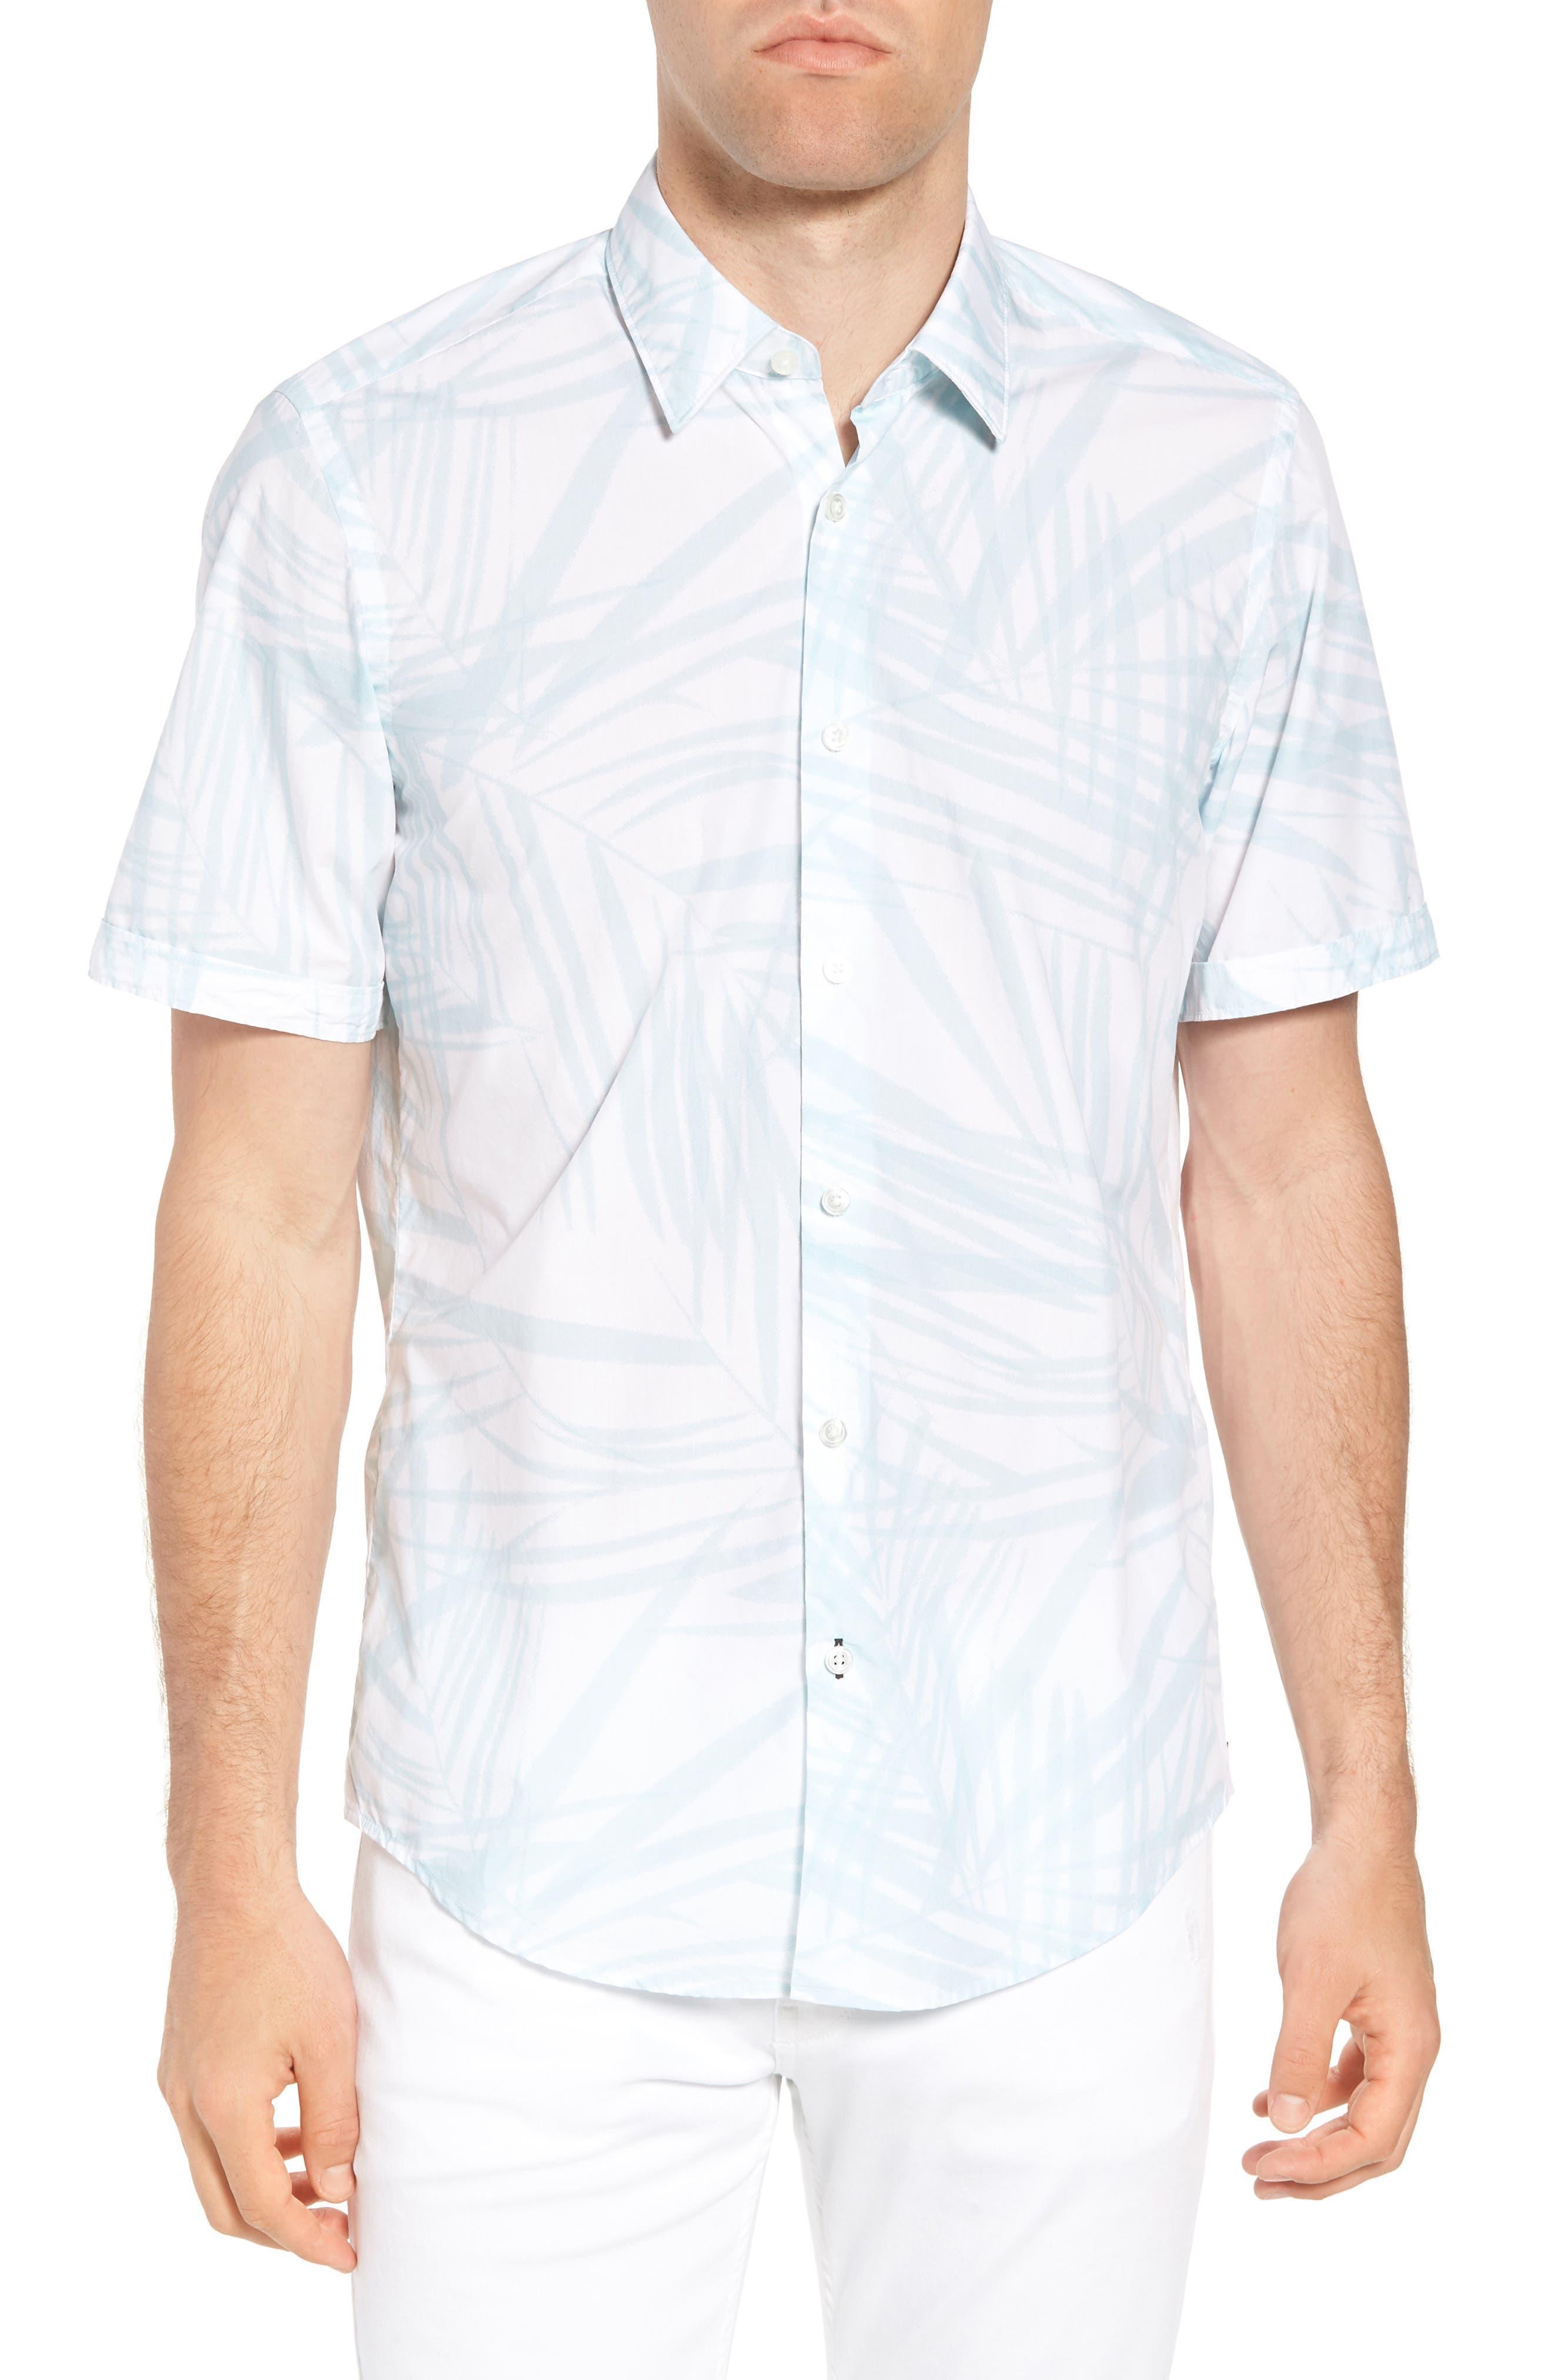 Luka Regular Fit Short Sleeve Sport Shirt,                             Main thumbnail 1, color,                             456